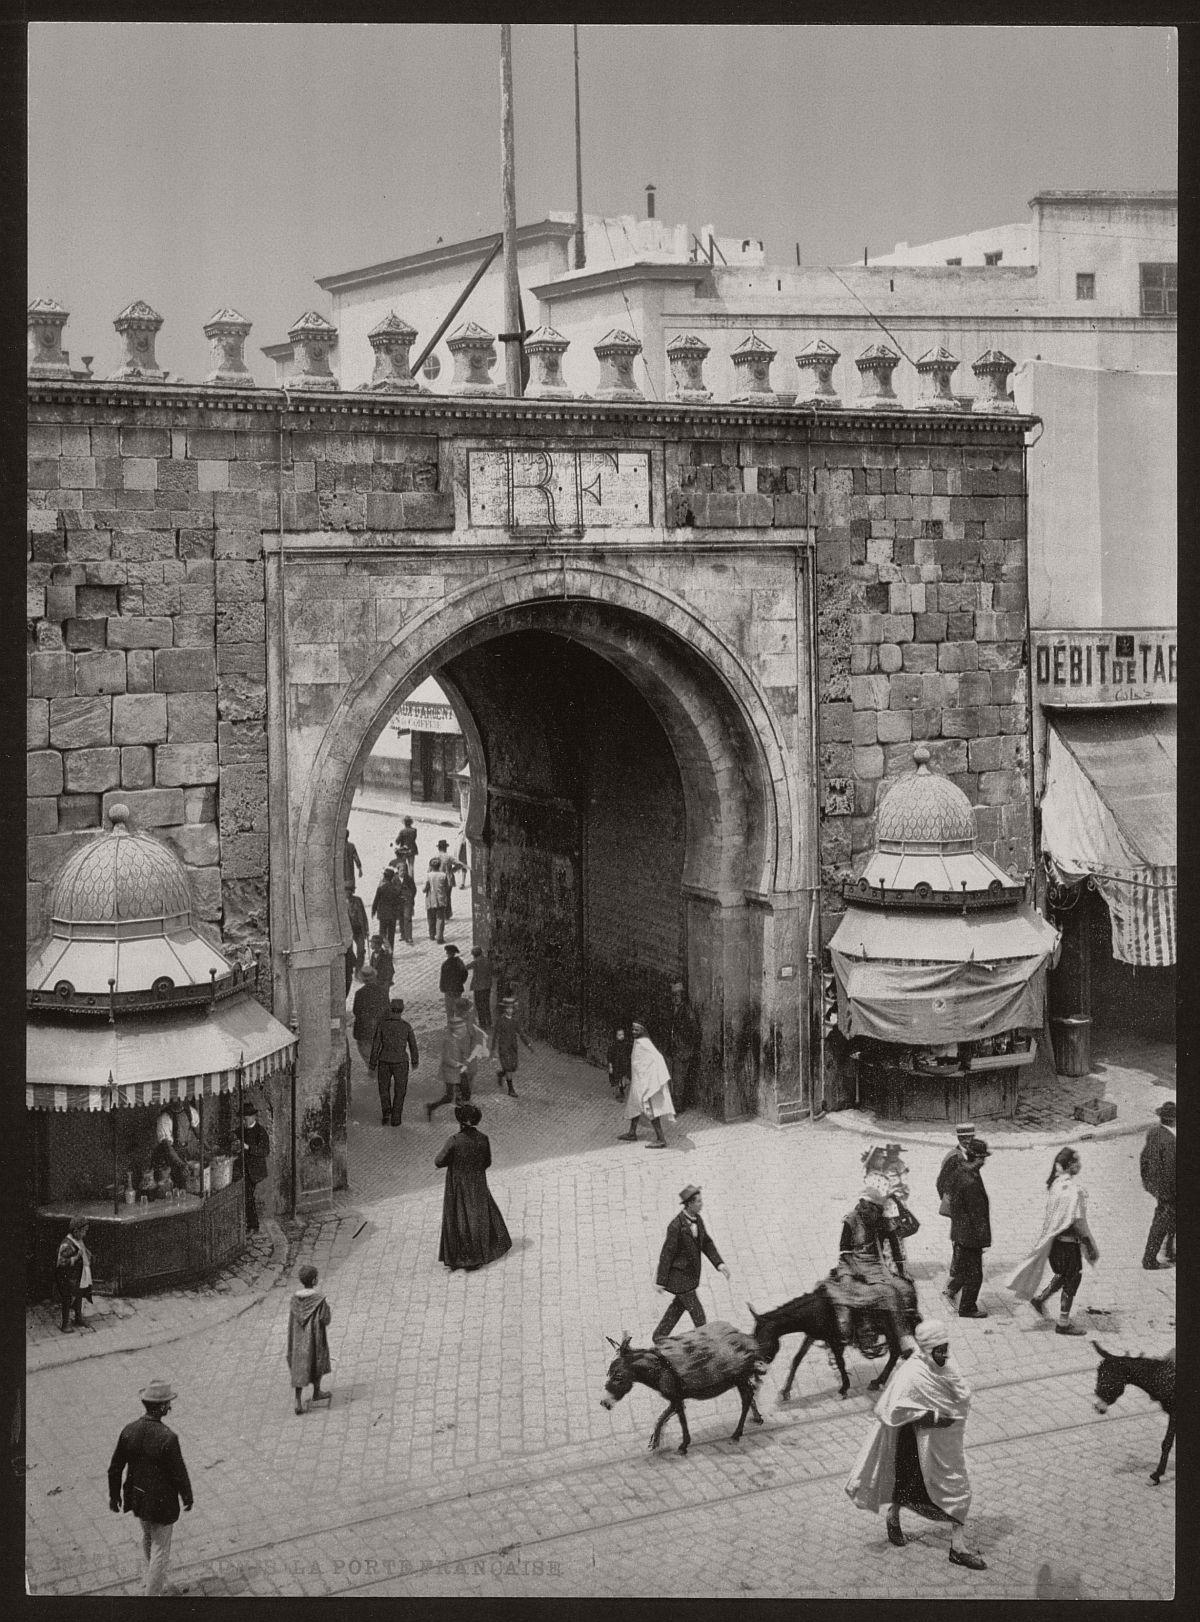 vintage-bw-photos-of-tunis-tunisia-late-19th-century-05